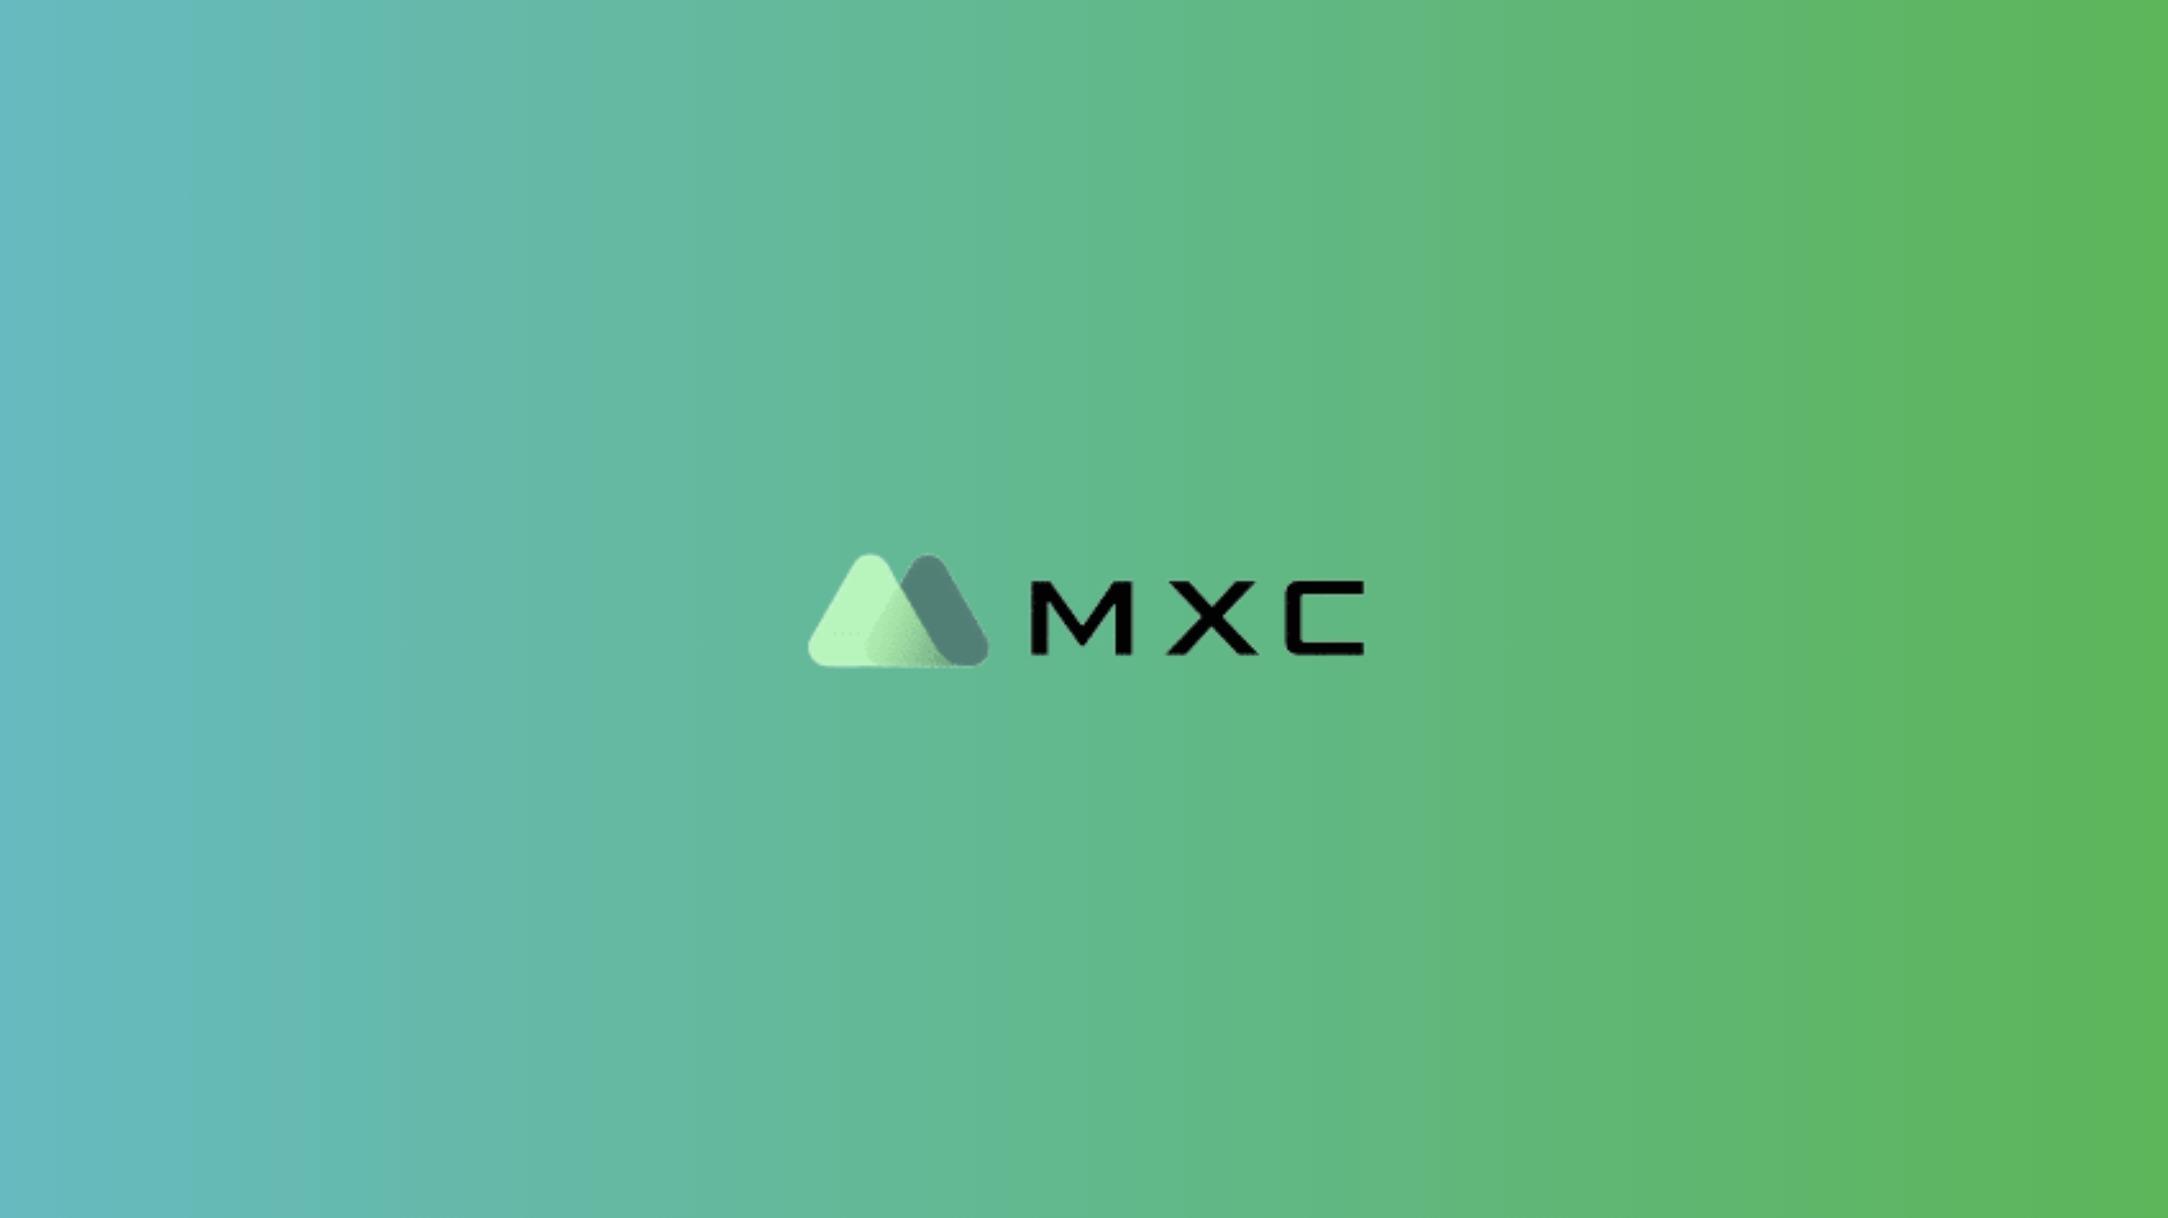 MXCの特徴・口座開設方法をわかりやすく解説!【良い銘柄を早く上場させる】